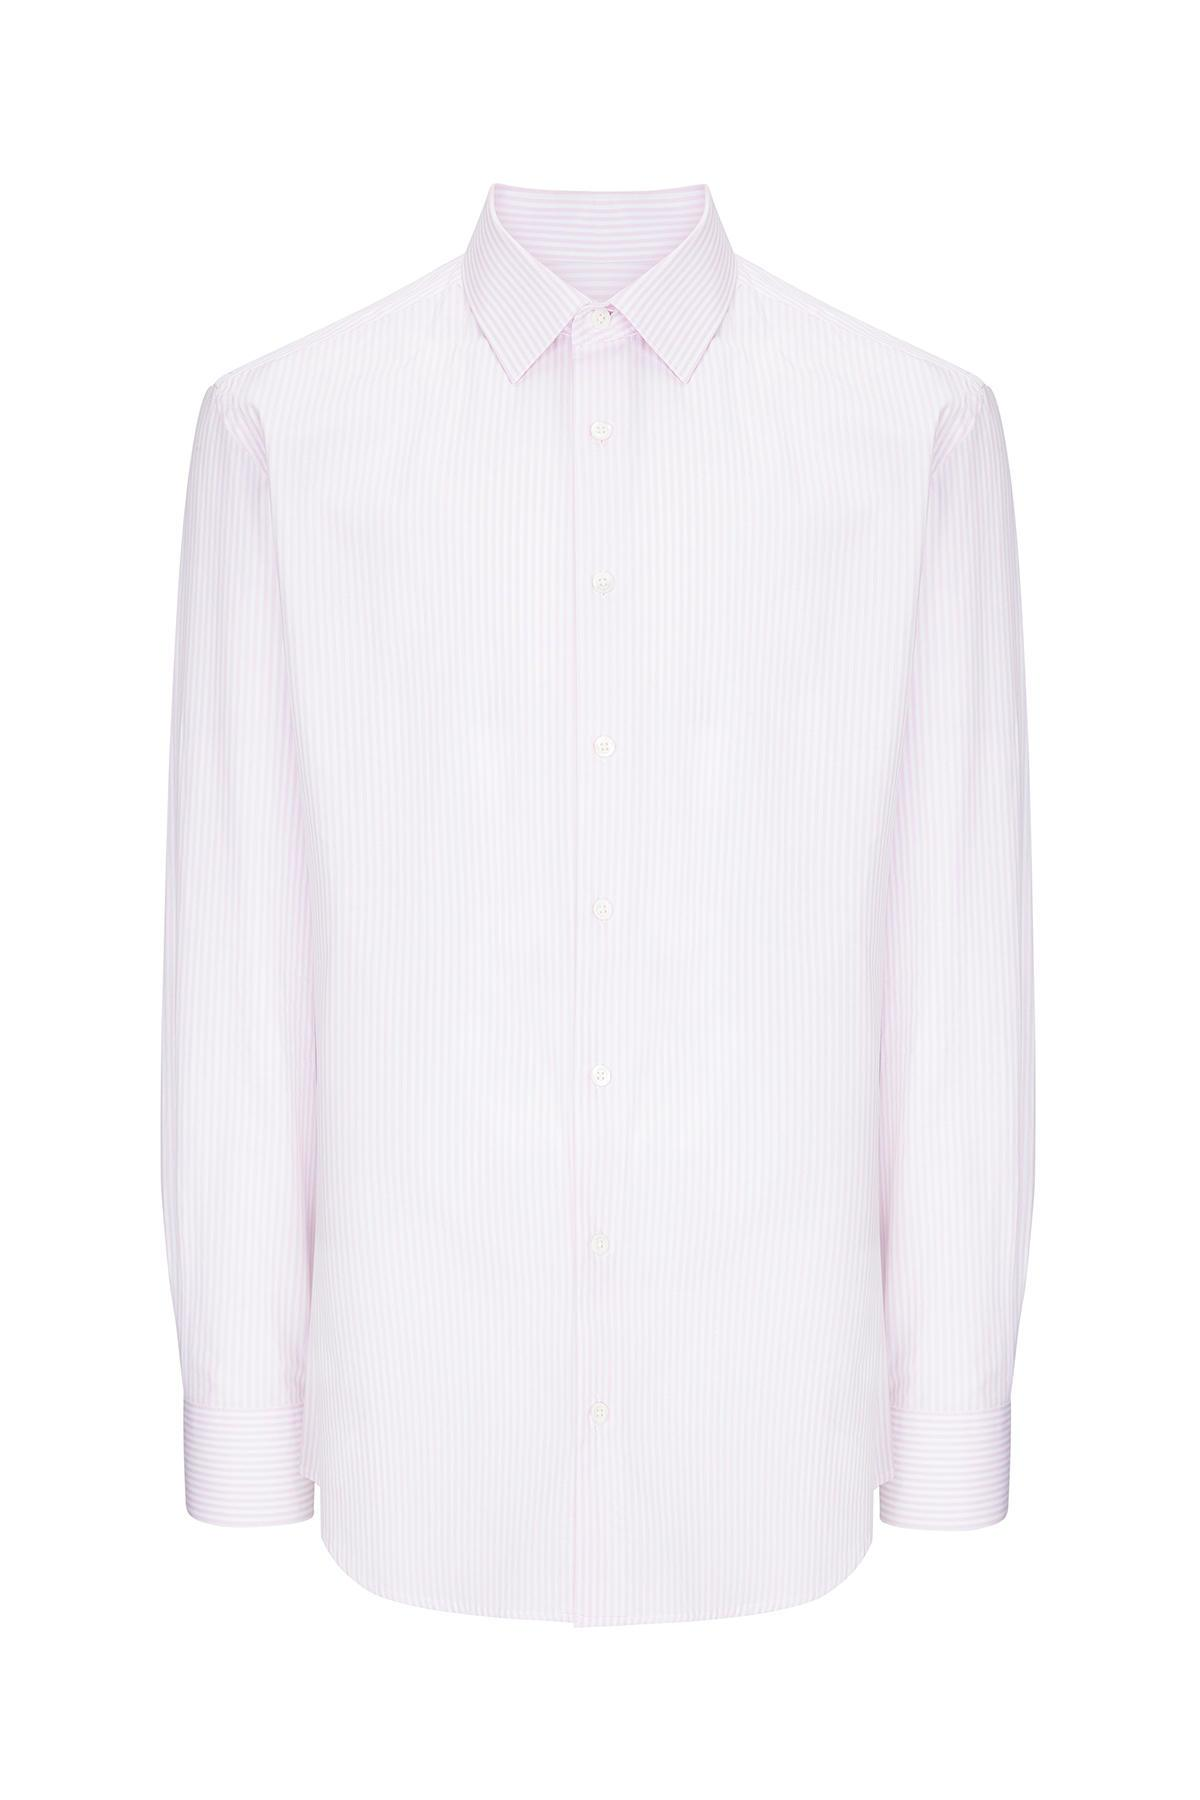 Pembe Beyaz Çizgili Pamuk Gömlek